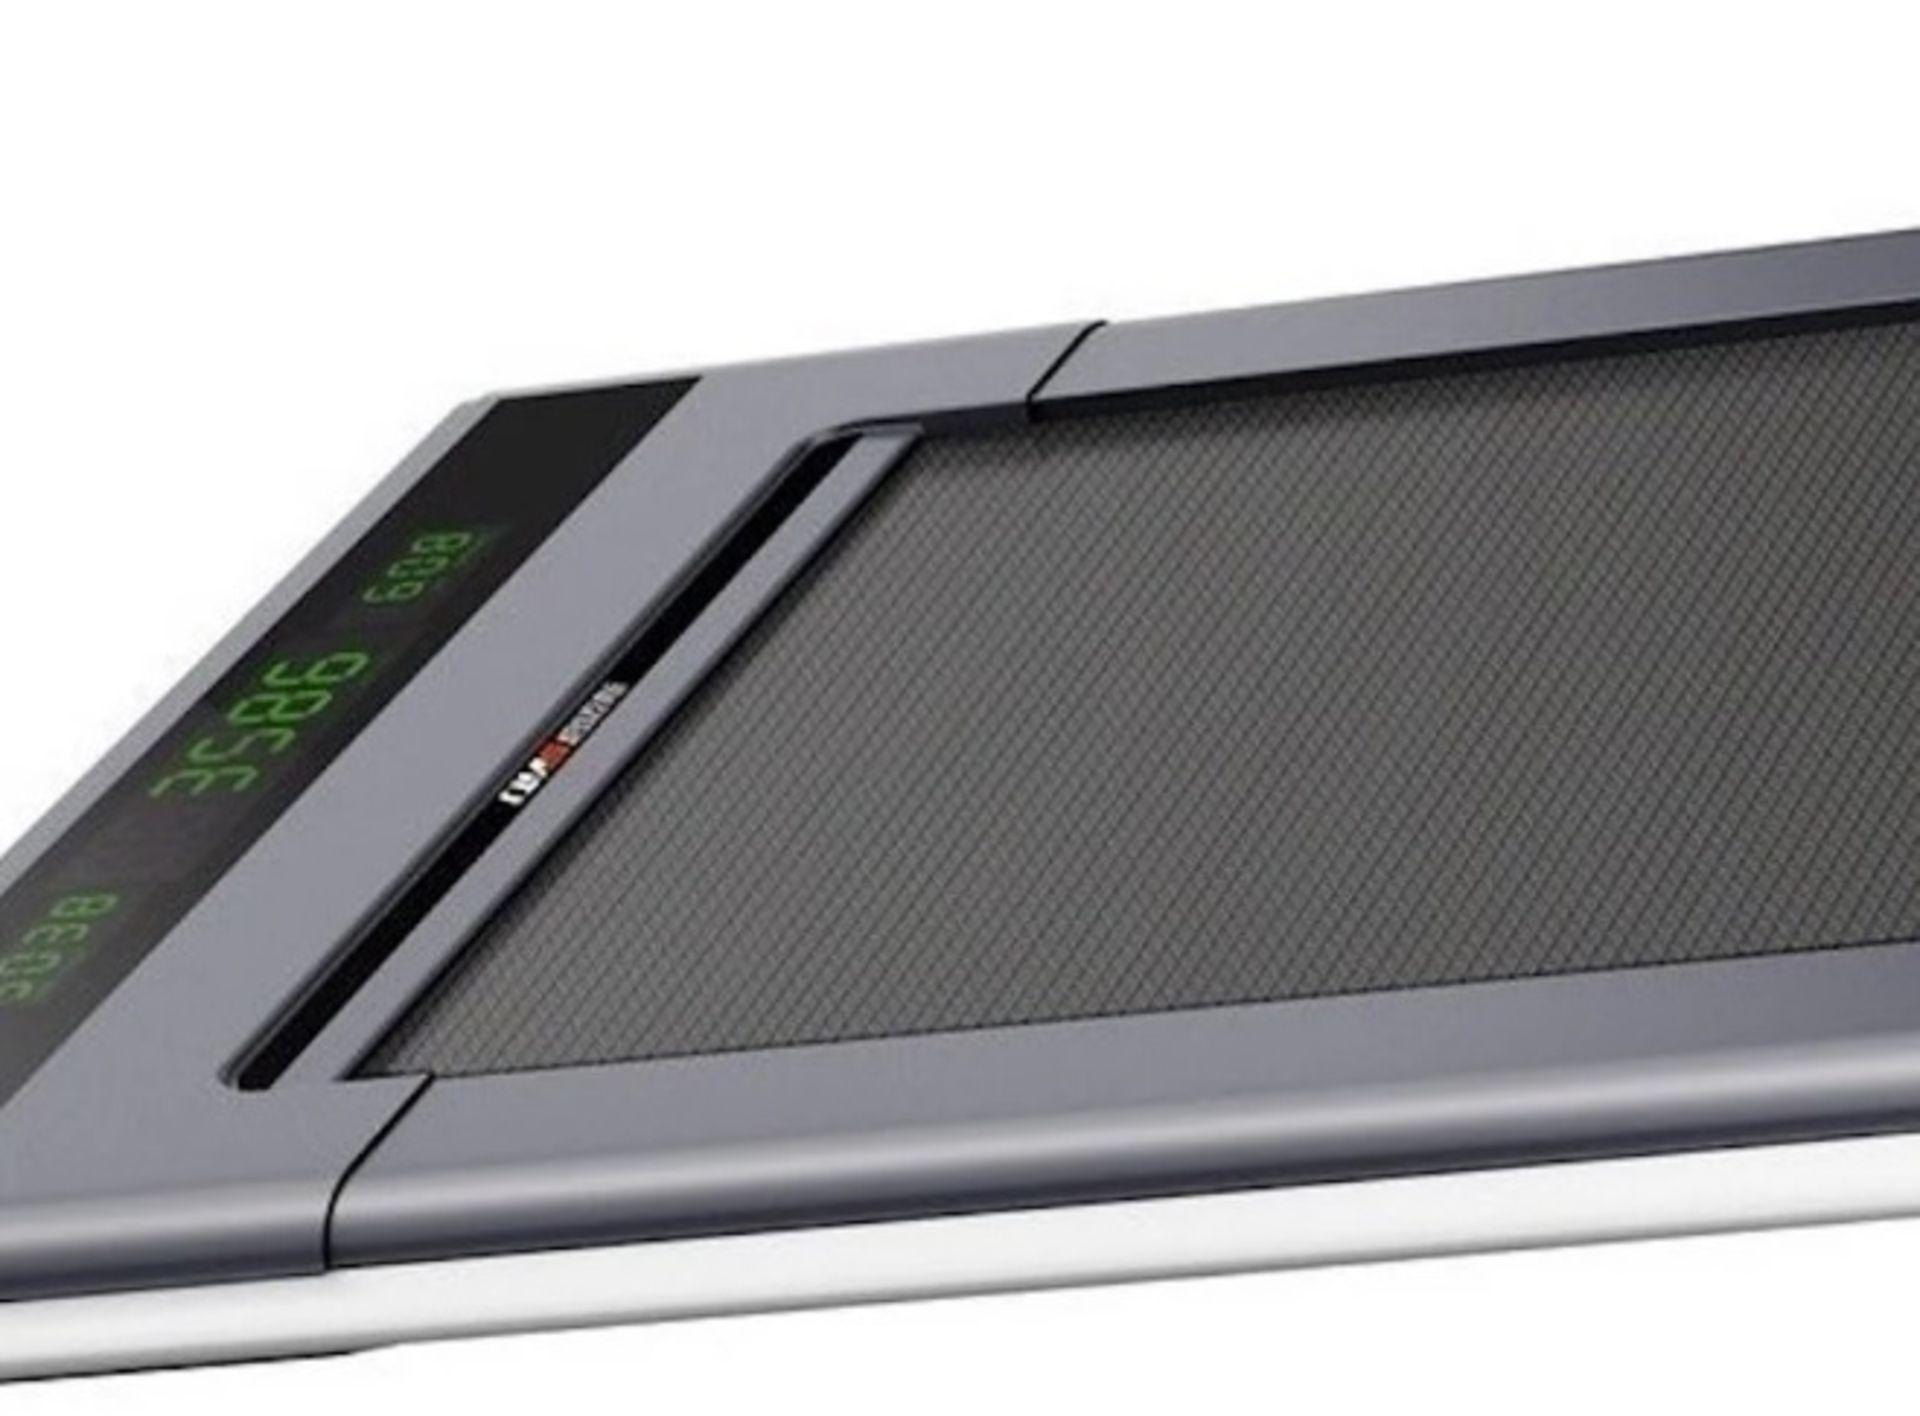 1 x Slim Tread Ultra Thin Smart Treadmill Running / Walking Machine - Lightweight With Folding - Image 19 of 19